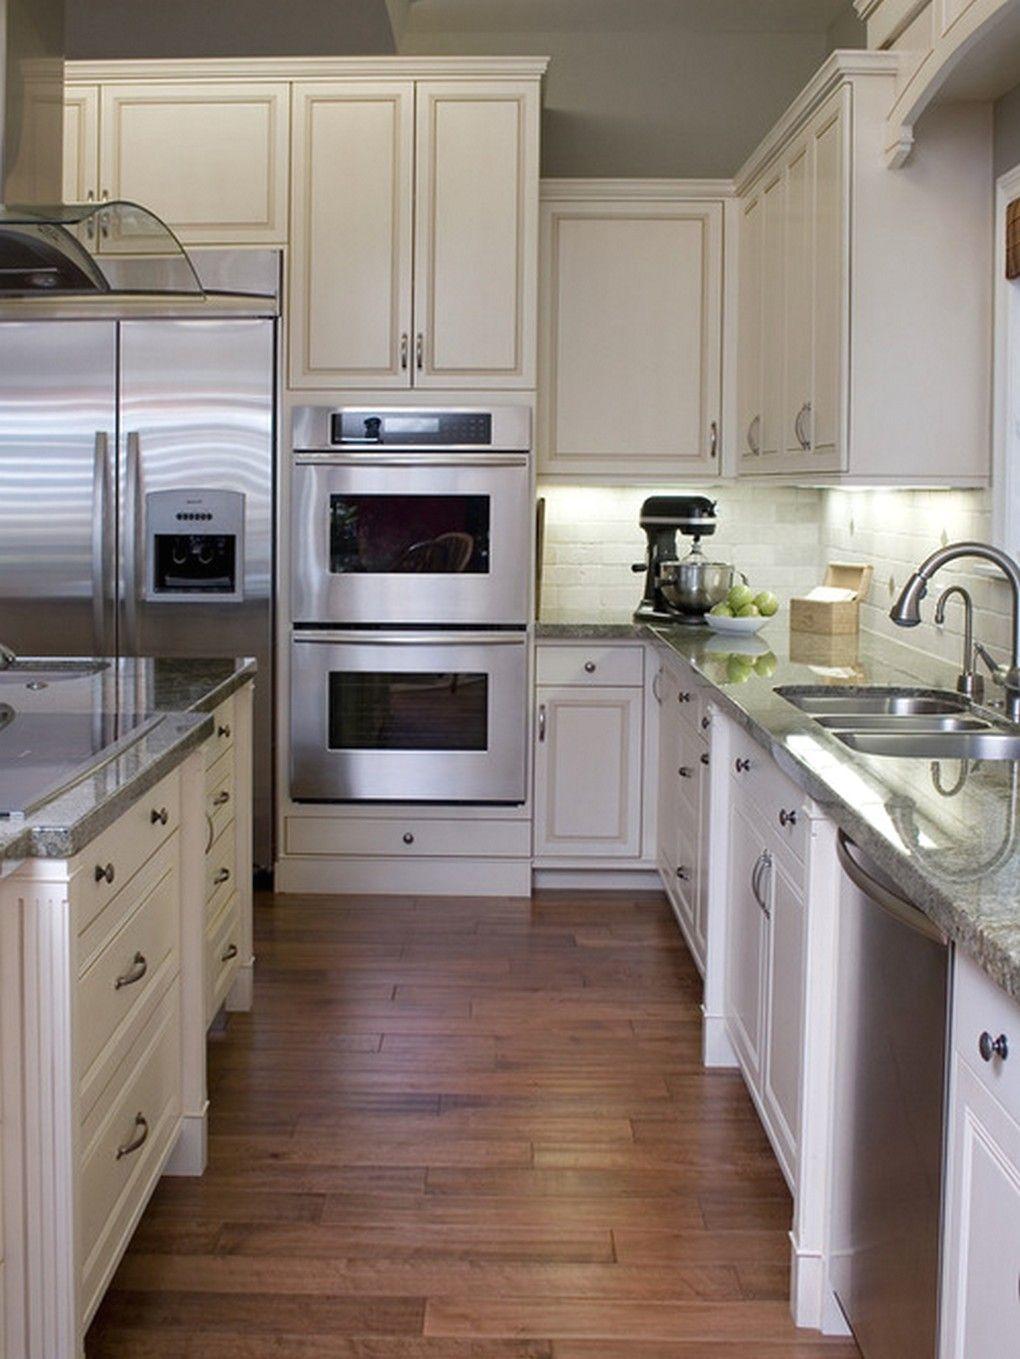 Amish Made Kitchen Cabinets Kitchen Cabinetry Kitchen Fixtures Kitchen Faucets Or Kitchen Design Ideas Eclectic Kitchen Design Eclectic Kitchen Outdoor Kitchen Design